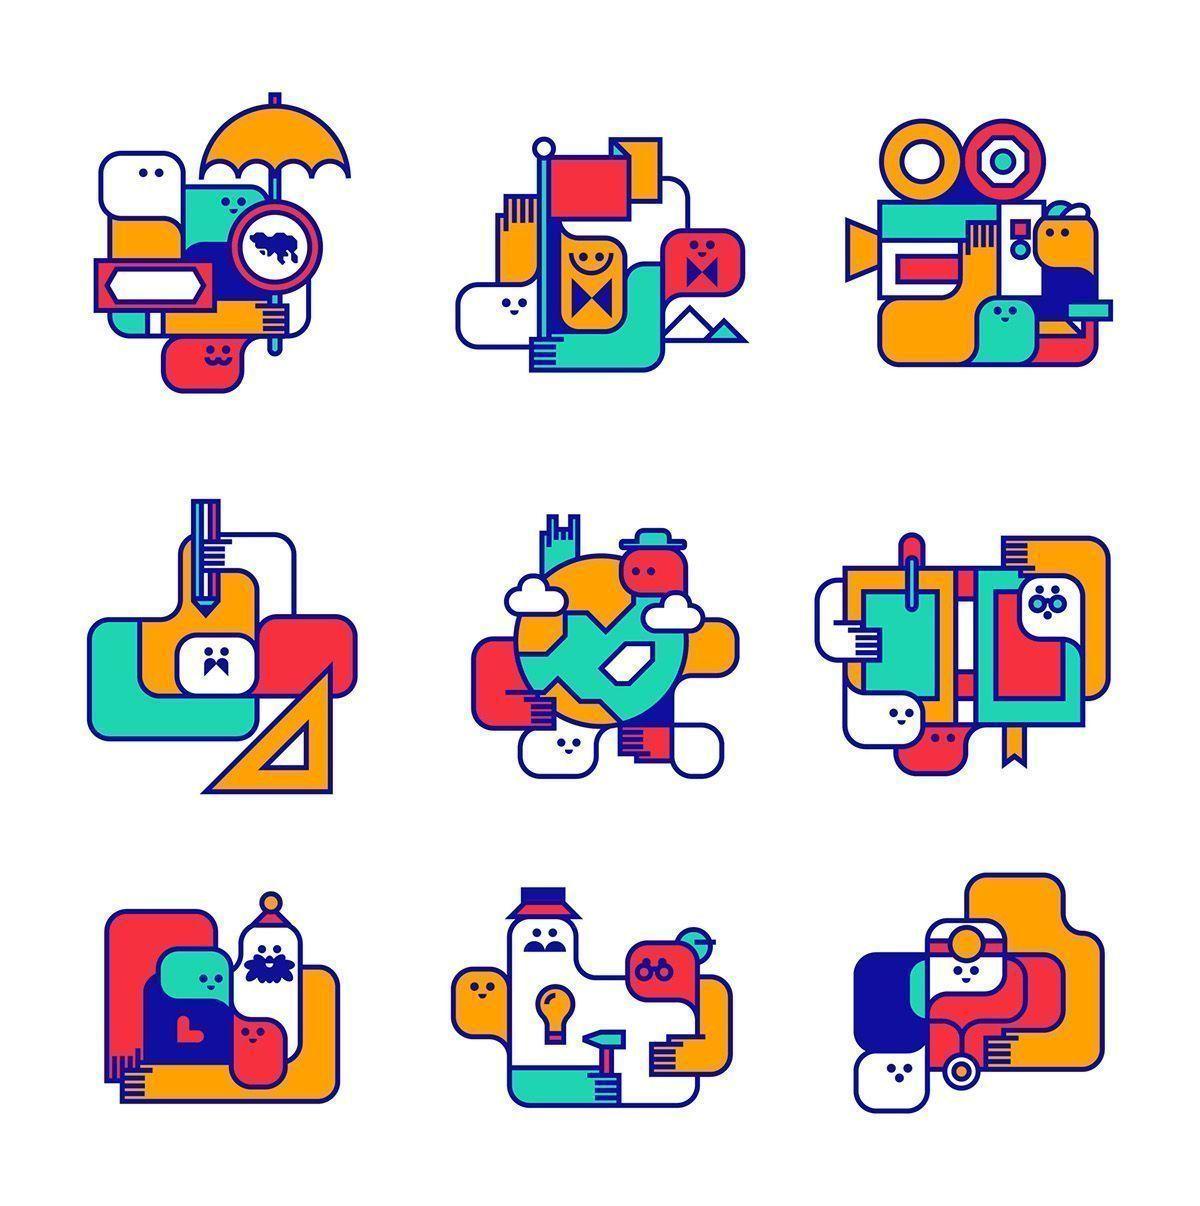 Social Innovation Festival 10dayfest Is An Annual Flagship Programme Organized By Jockey Club Desig Club Design Enterprise Logo Illustration Character Design